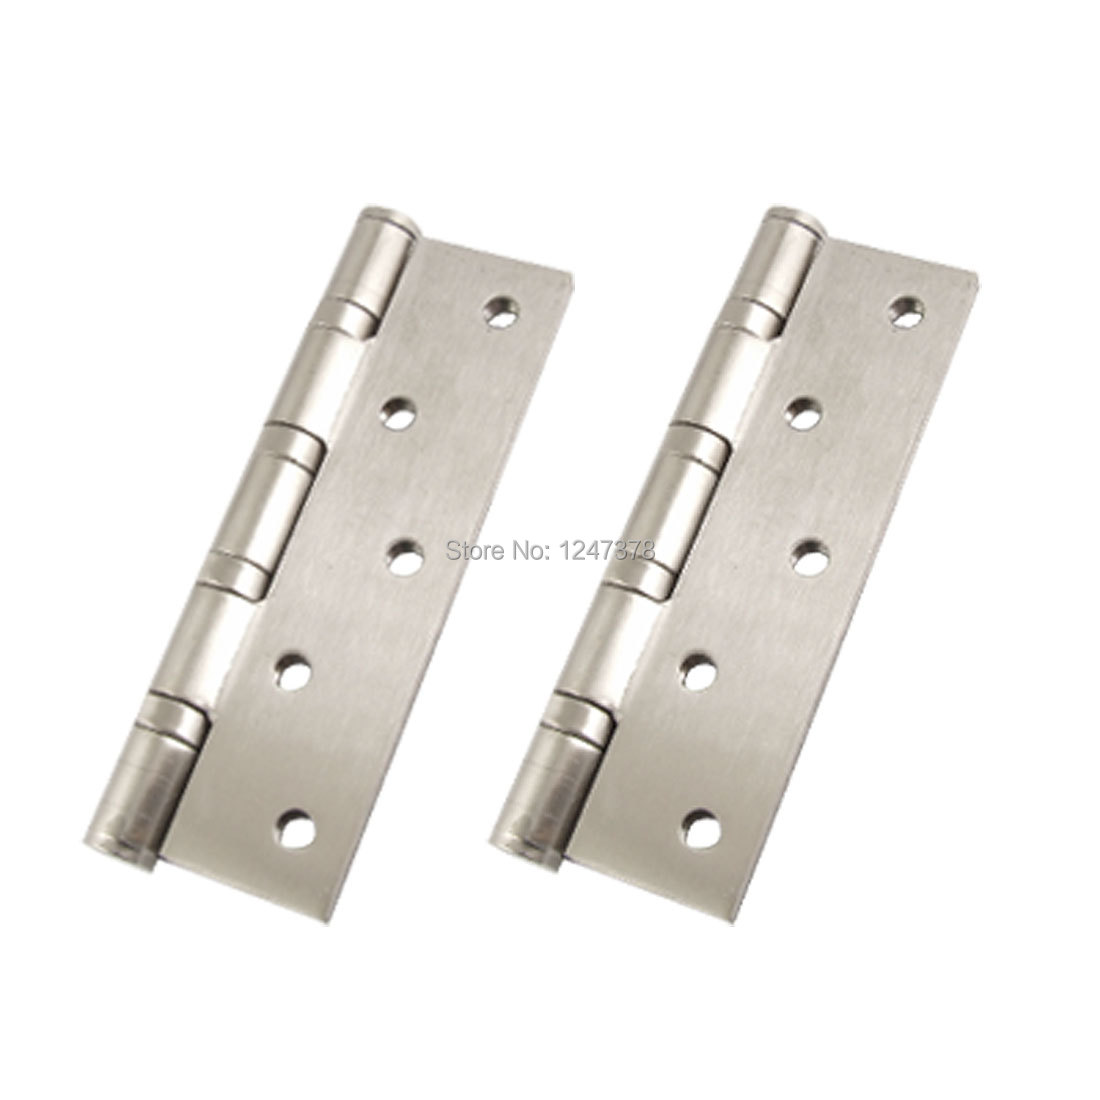 "Satin Nickel 5"" Window Screw Installing Door Hinges 2 Pcs/lot(China (Mainland))"